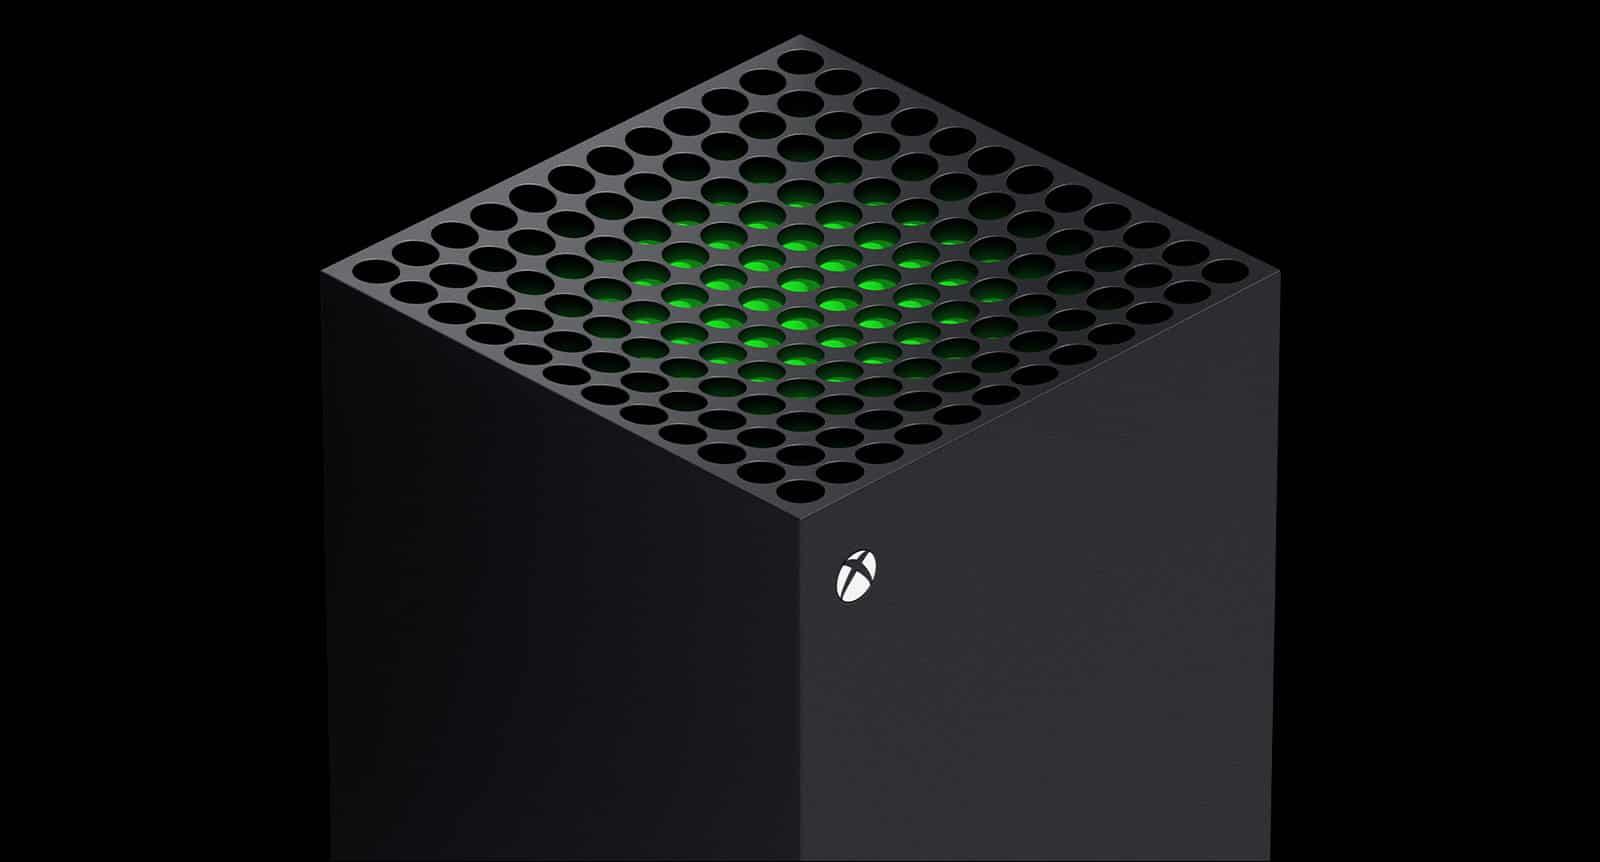 Microsoft Xbox Series X Next-Gen One Smart Delivery Loading Times fridge